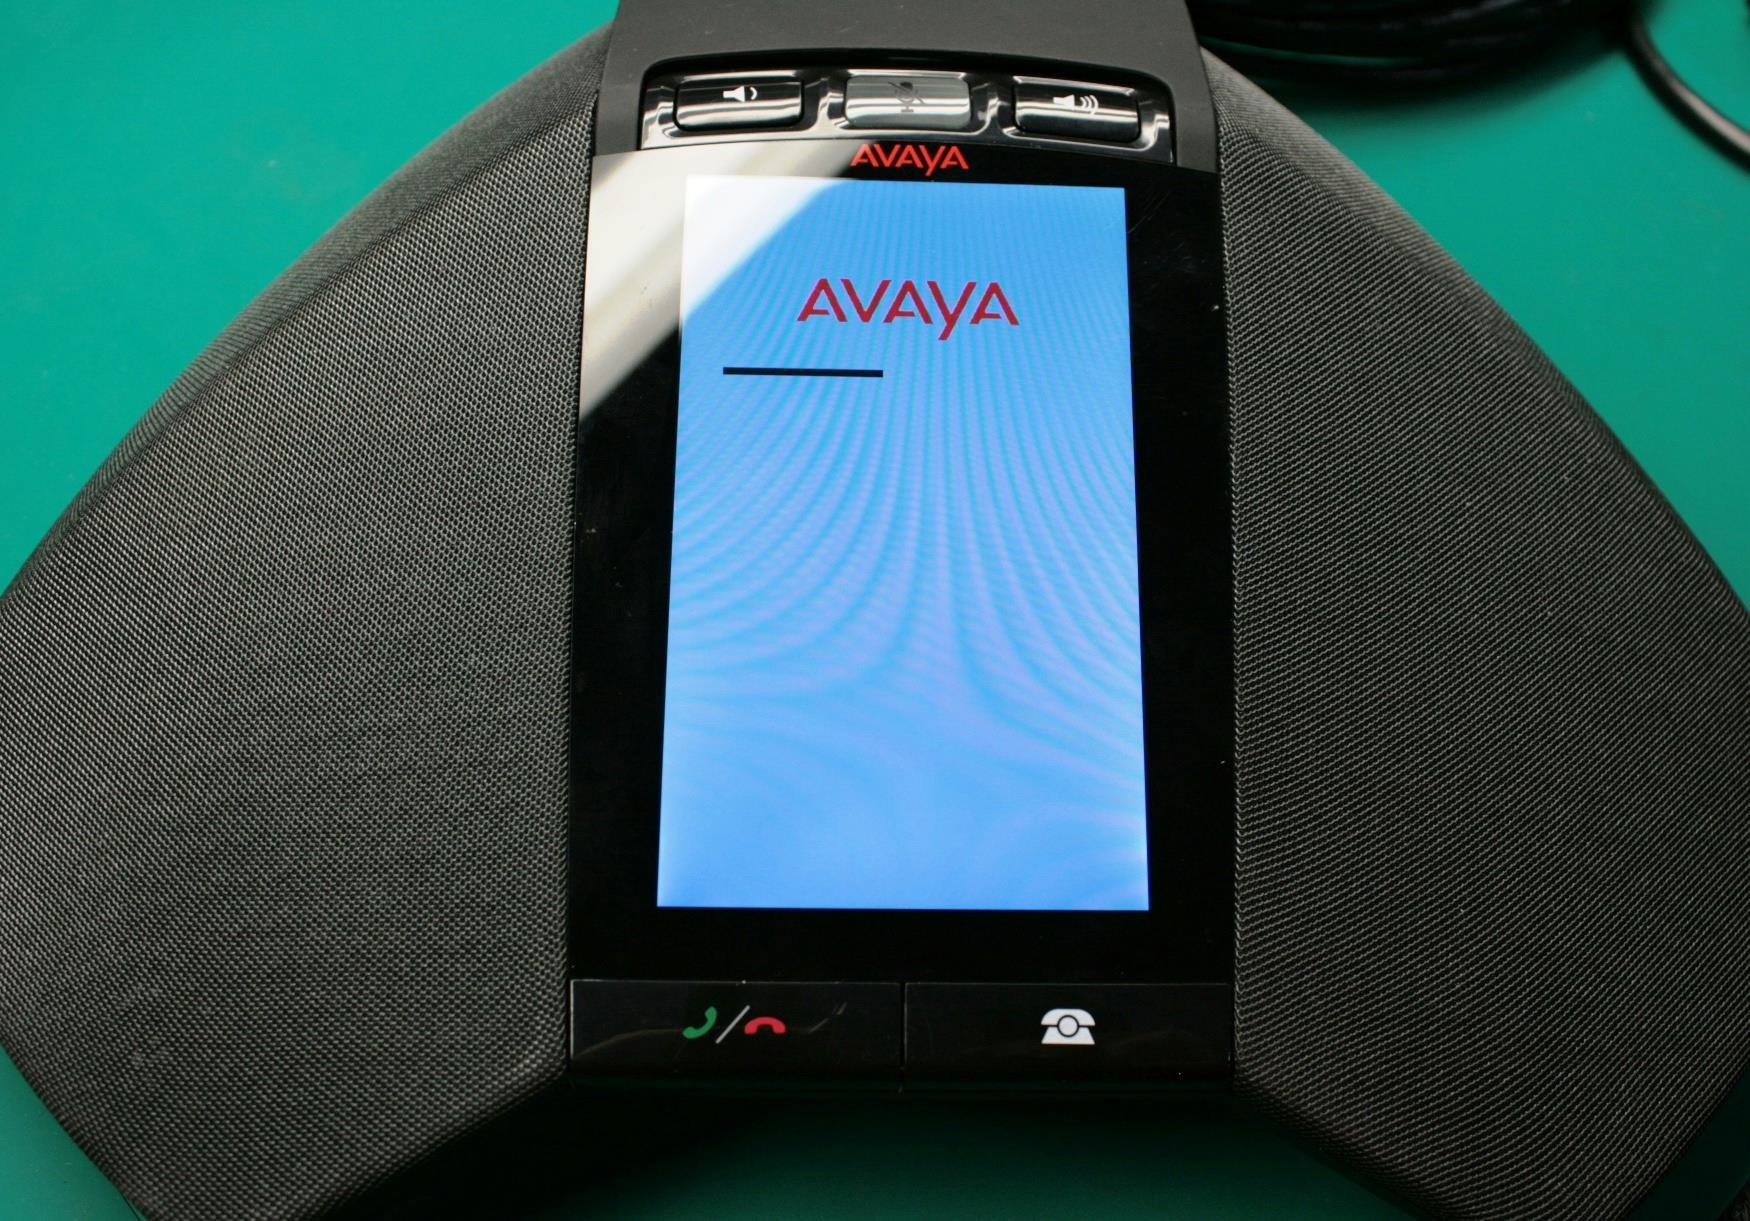 Avaya phone template instructions 2410d Digital